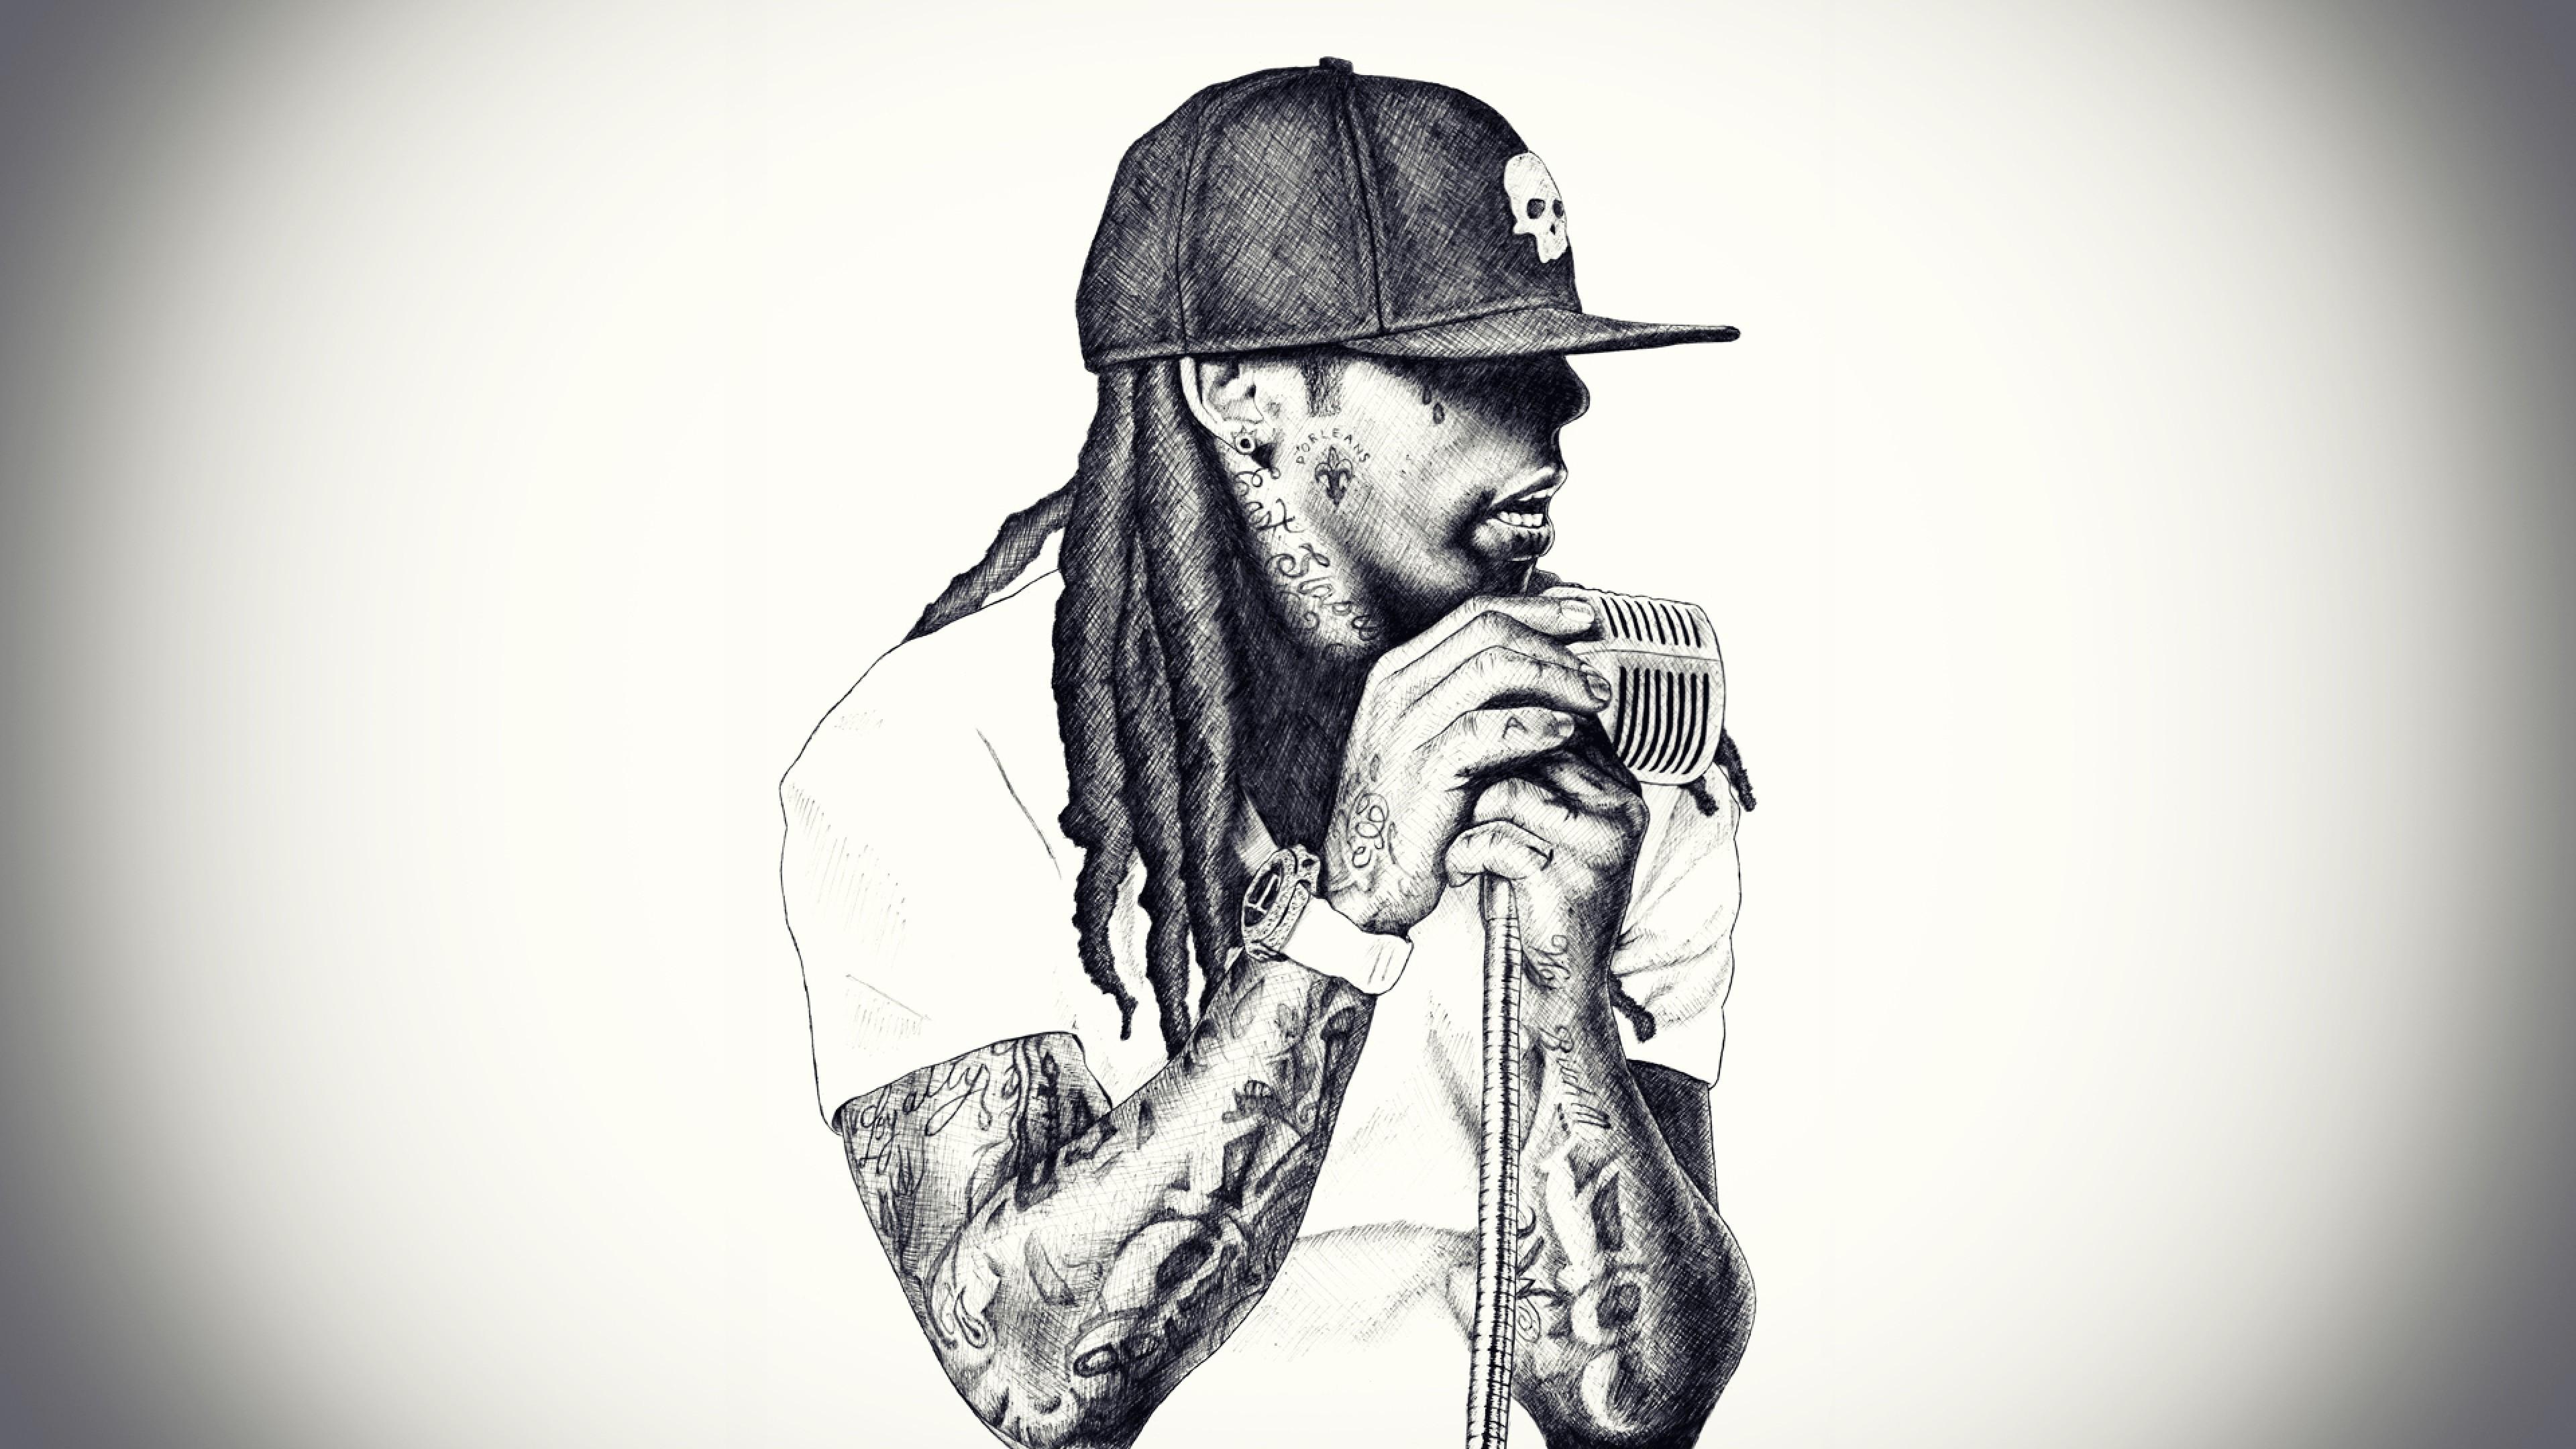 Preview wallpaper lil wayne, rap, singer, microphone, baseball cap,  dreadlocks 3840×2160